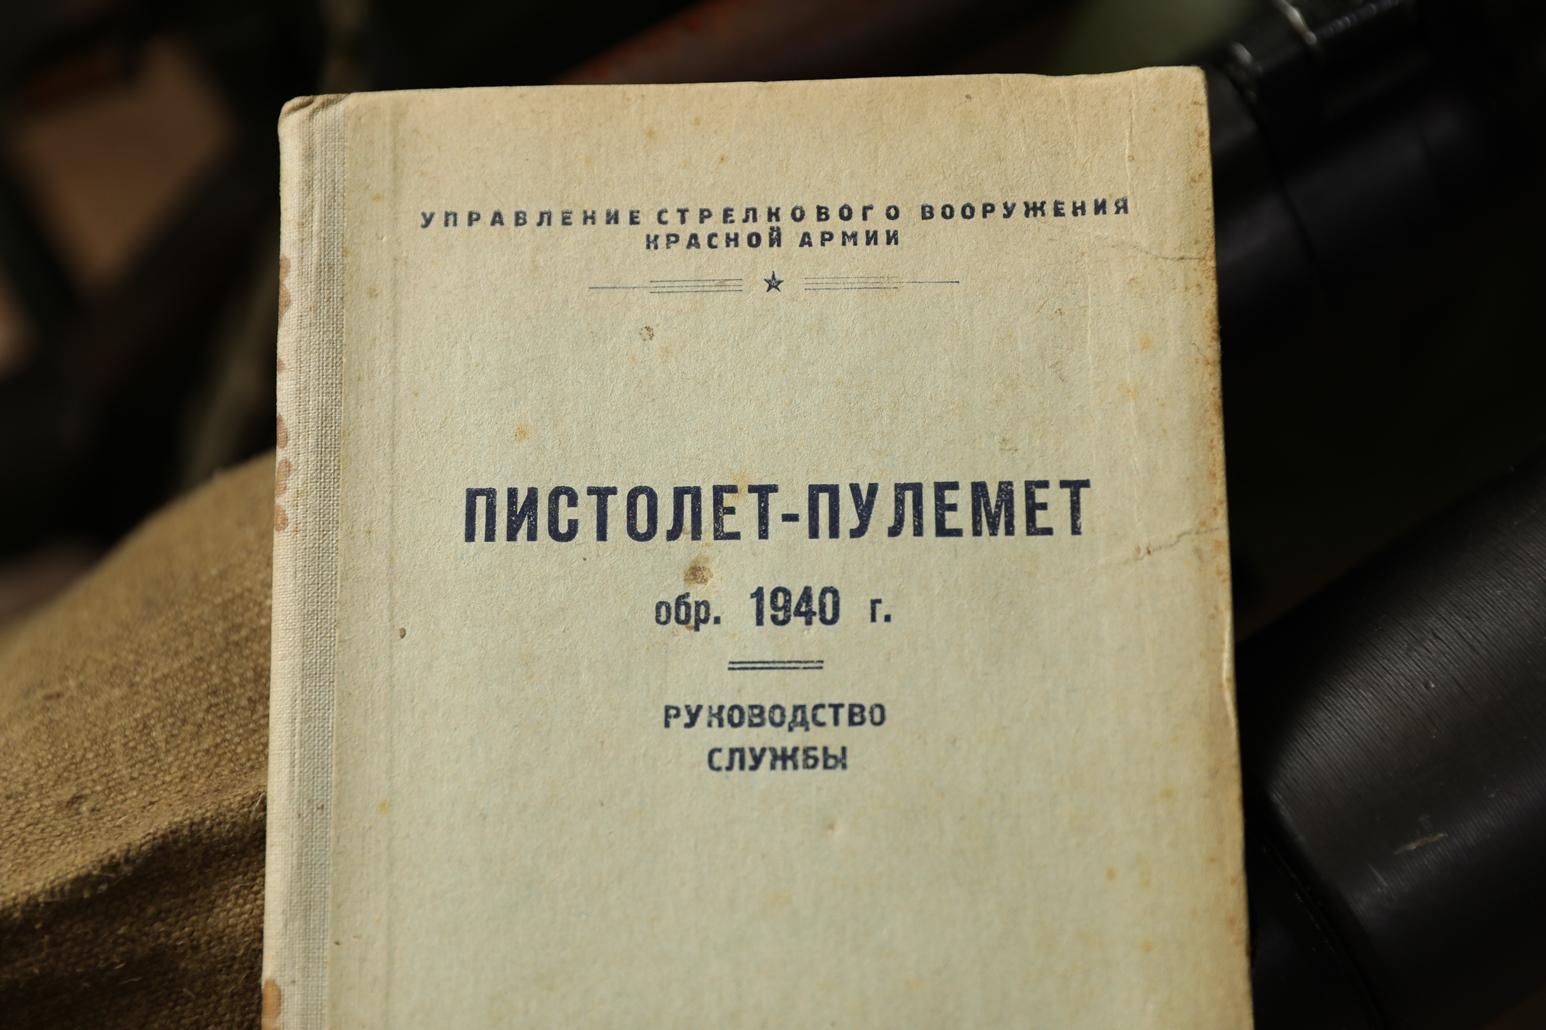 Руководство службы «пистолет-пулемет обр. 1940 год ППД-40», 1941 год